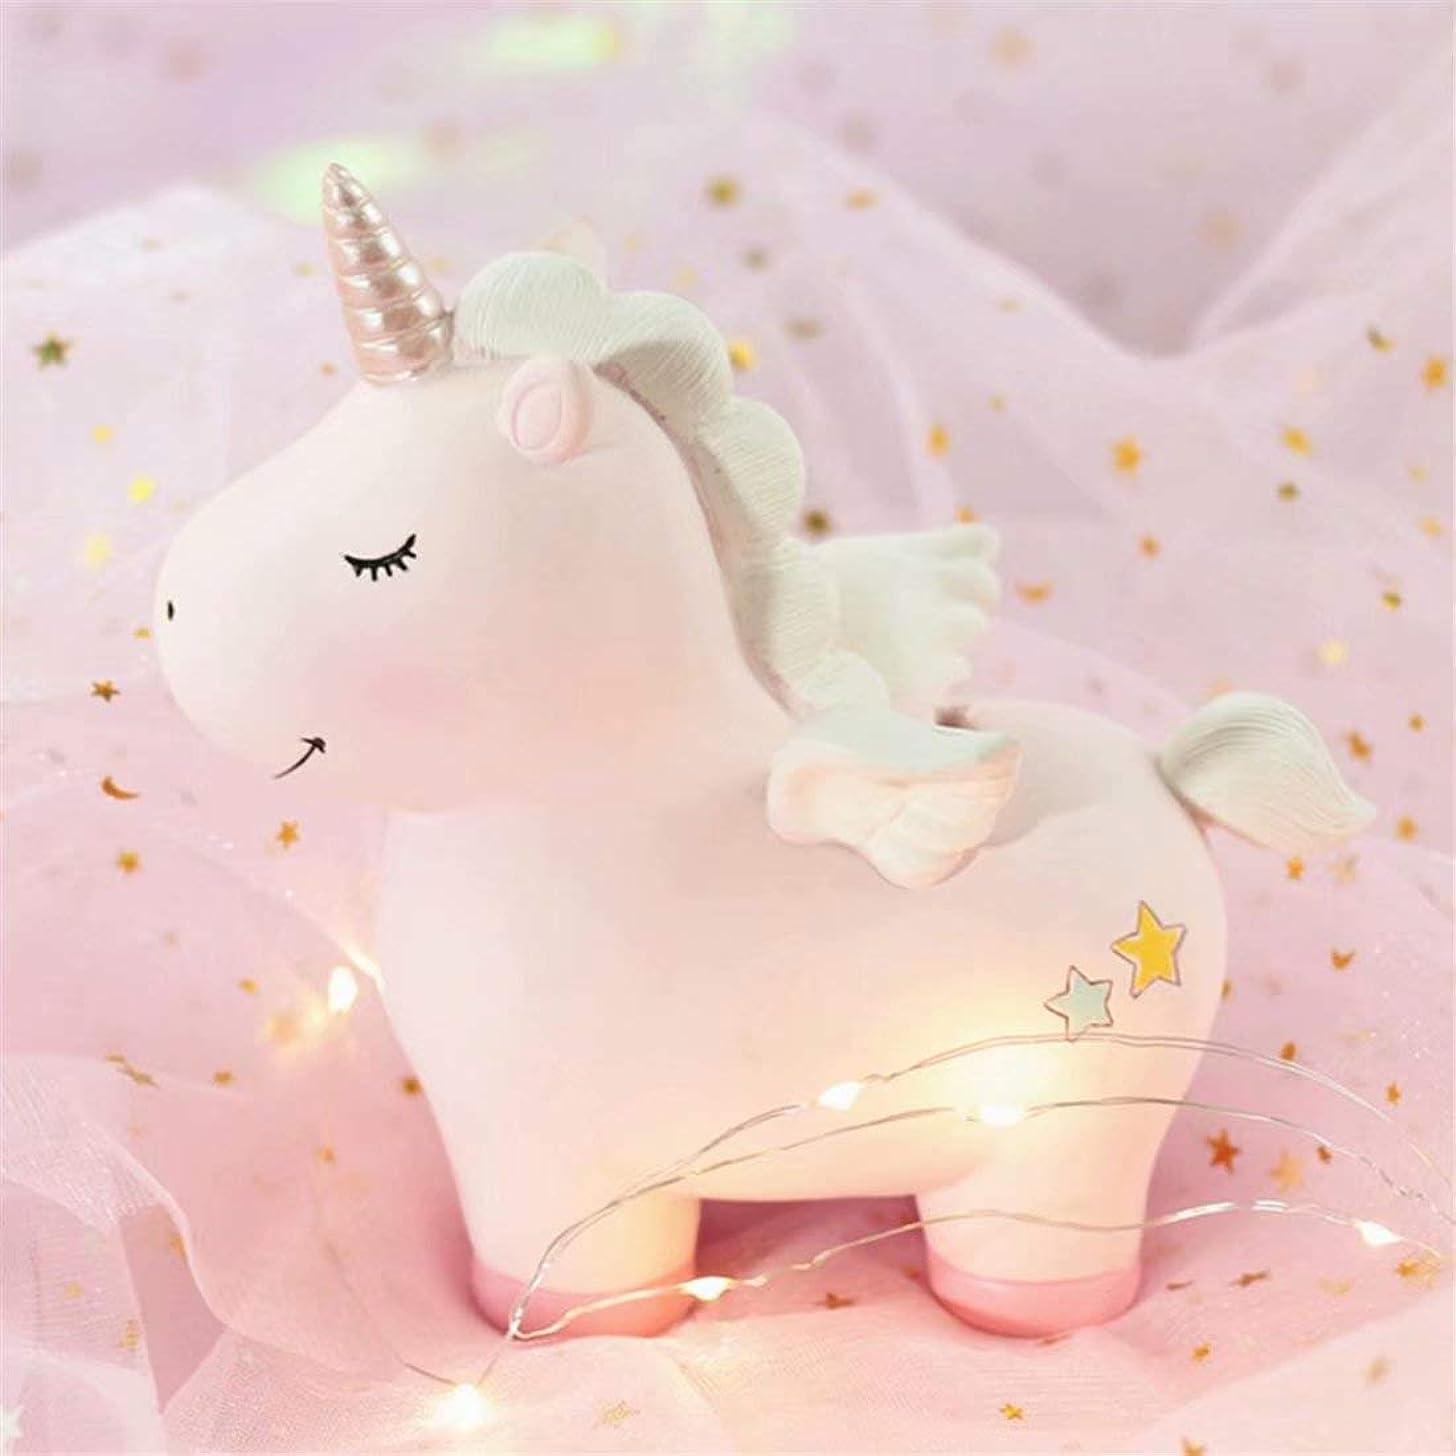 TMROW Baby Night Light Cute Unicorn Moon Night Light for Kids Baby Girls Toy Creative Home Decoration as a Birthday Christmas Valentine's Day Gift 11X15cm